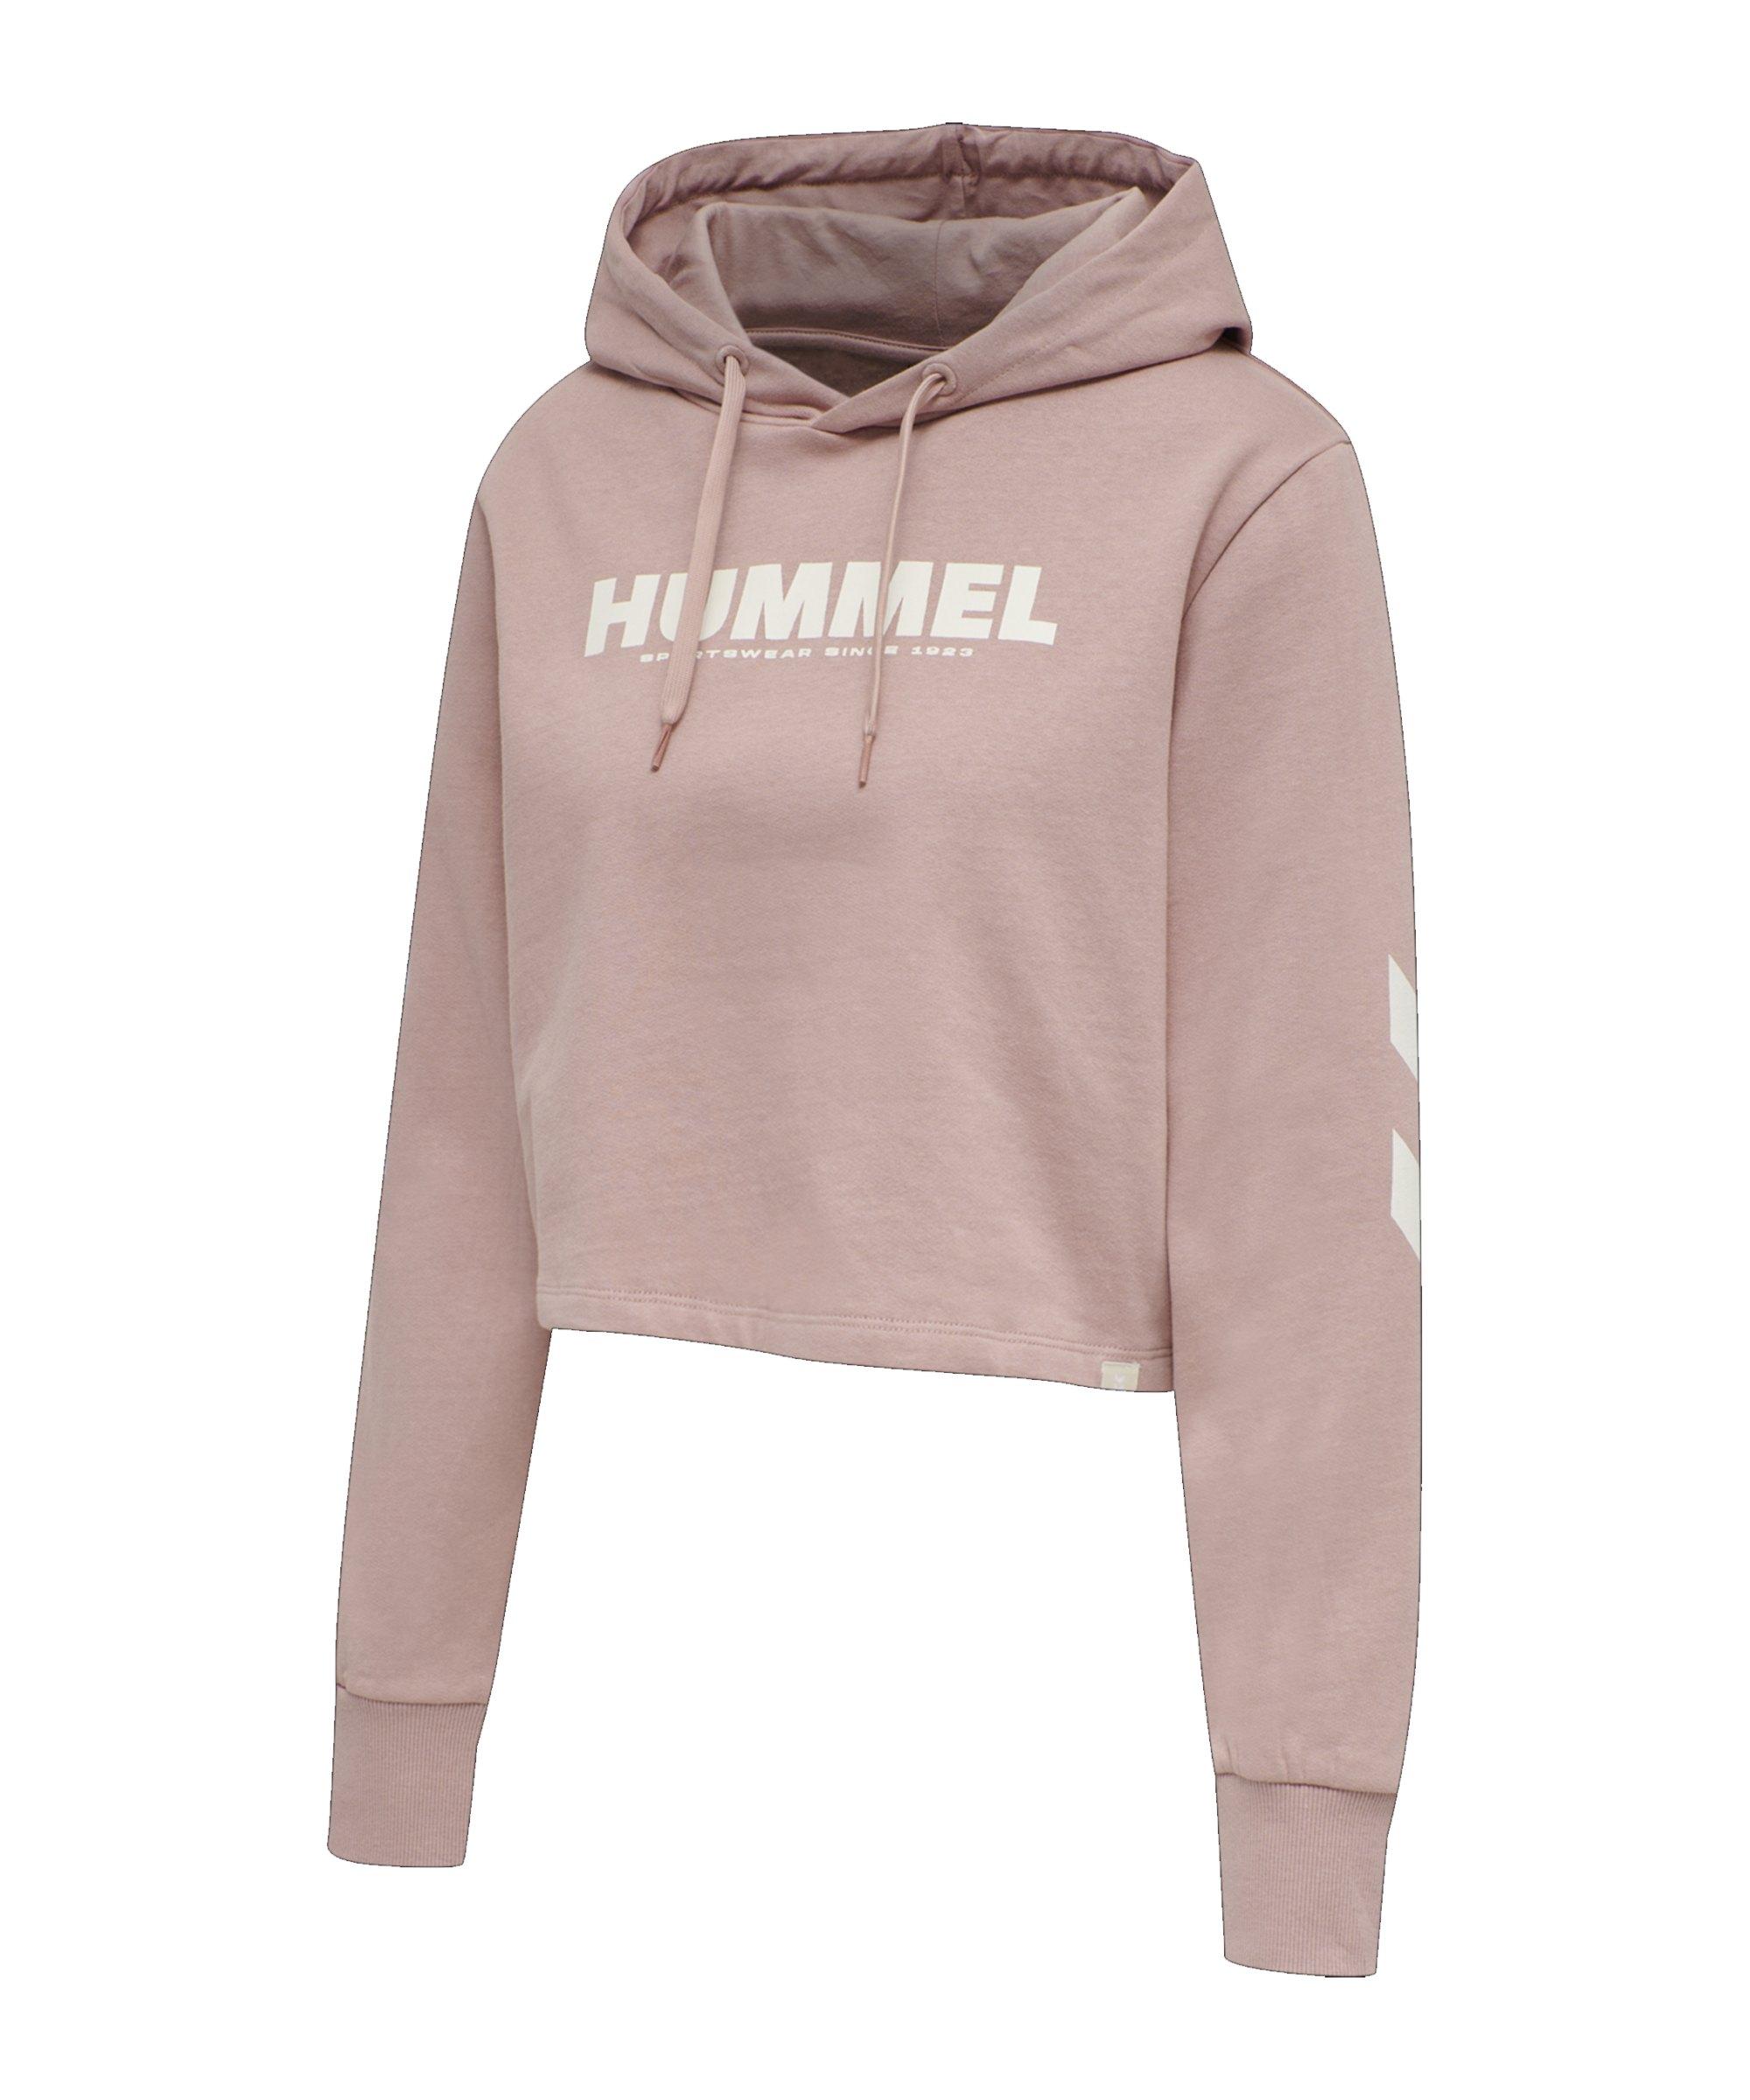 Hummel Legacy Cropped Hoody Damen Rosa F4852 - rosa